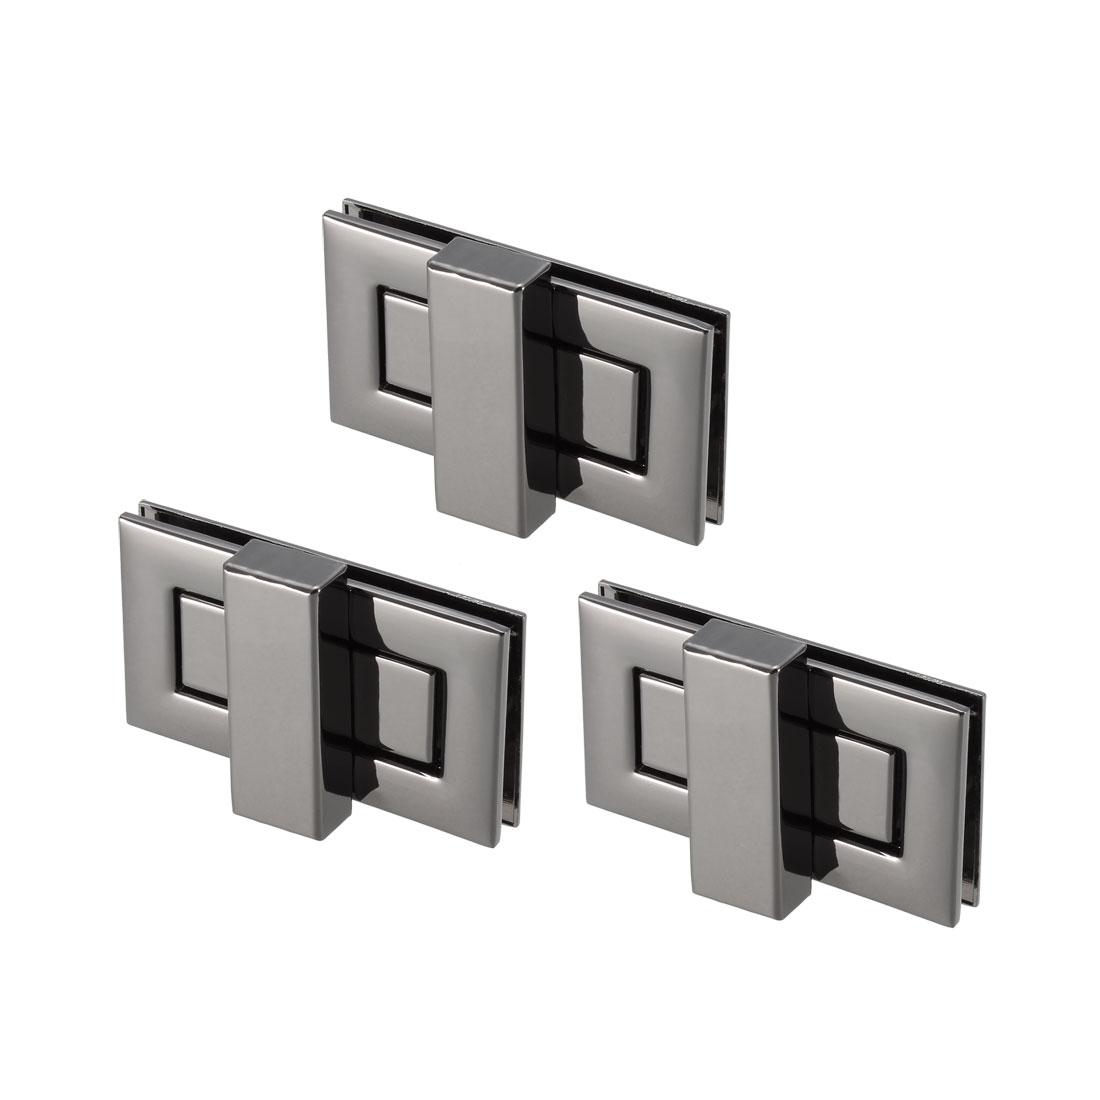 3 Sets Rectangular Purses Twist Lock 52mm x 29mm Clutches Closures - Black